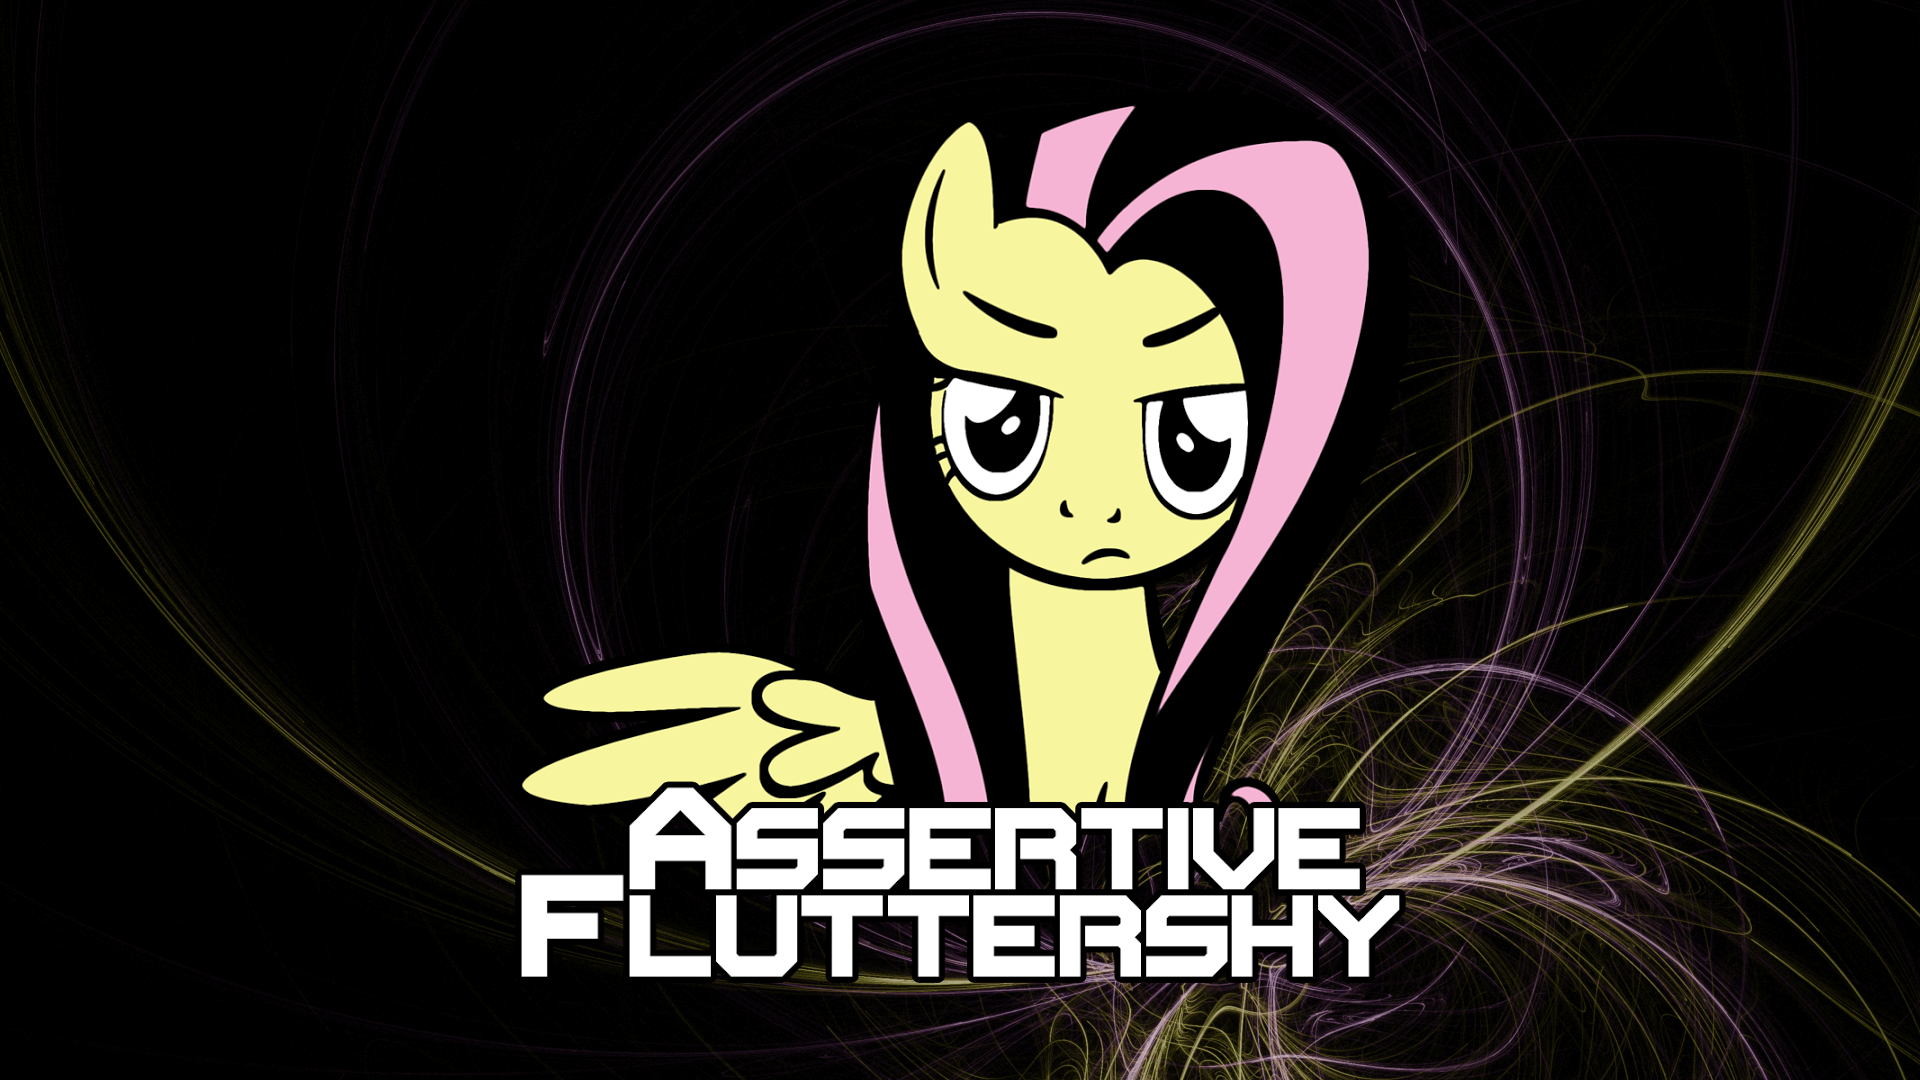 assertive fluttershy wallpaper 1080p by dubnation42 on